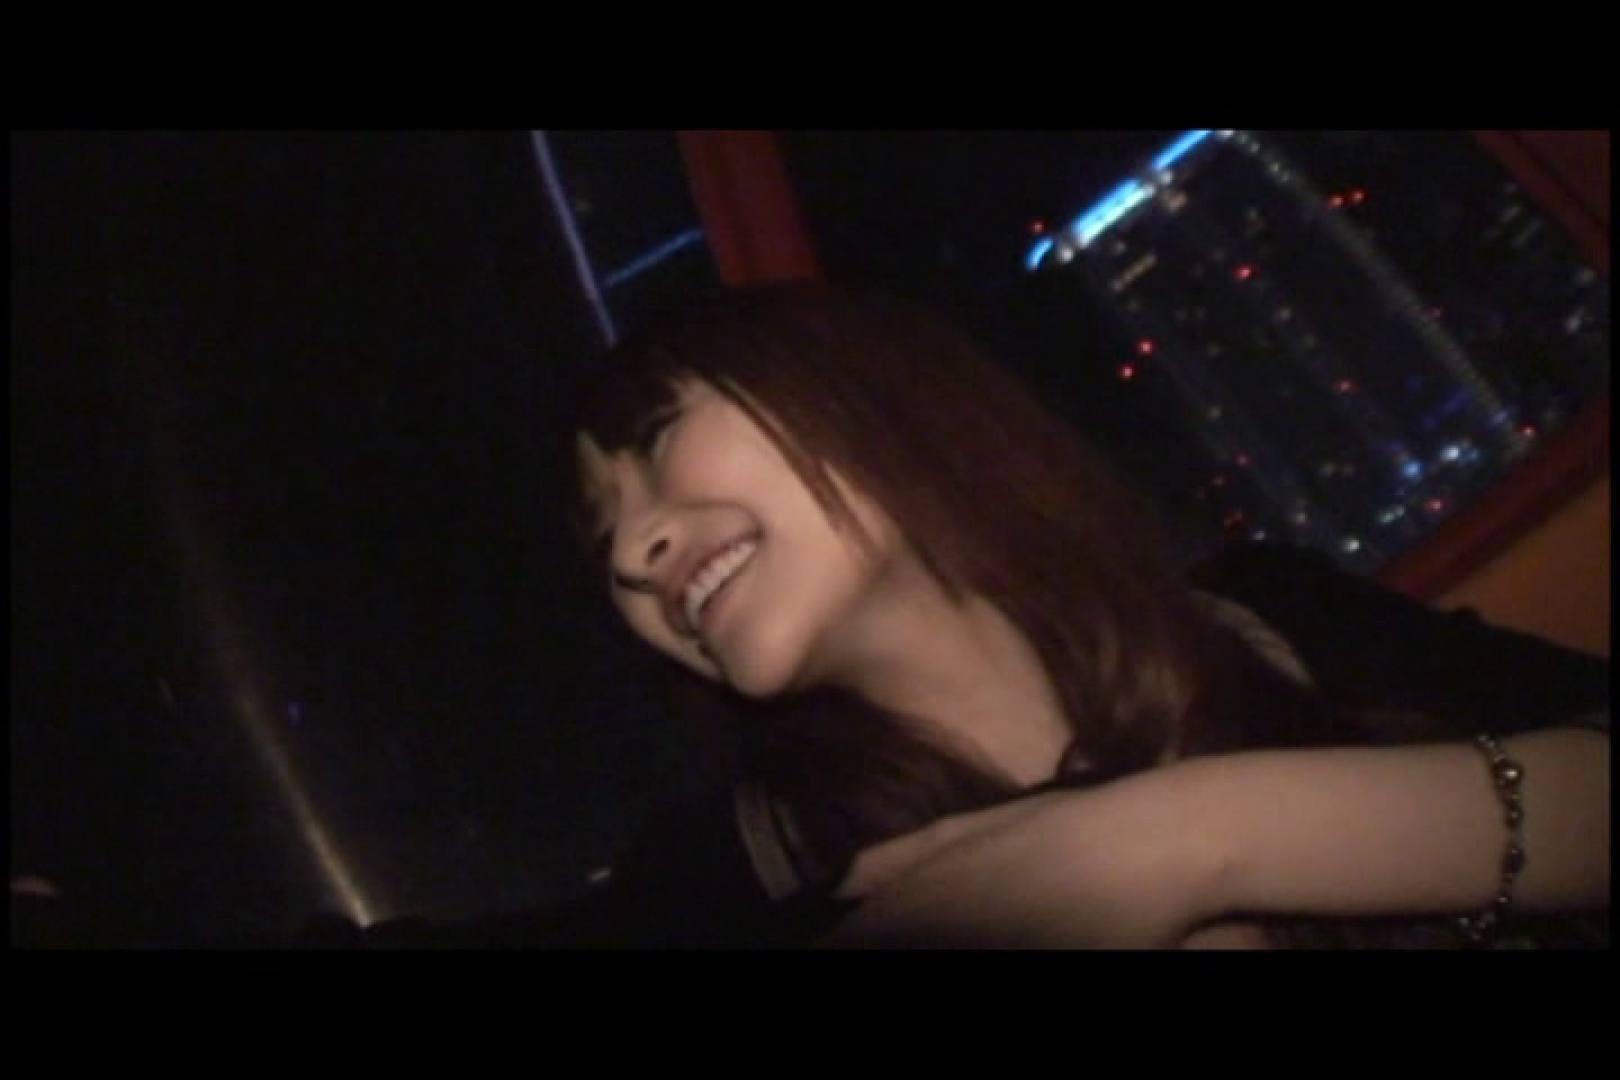 JDハンター全国ツアー vol.058 後編 女子大生のエロ動画  106PIX 30